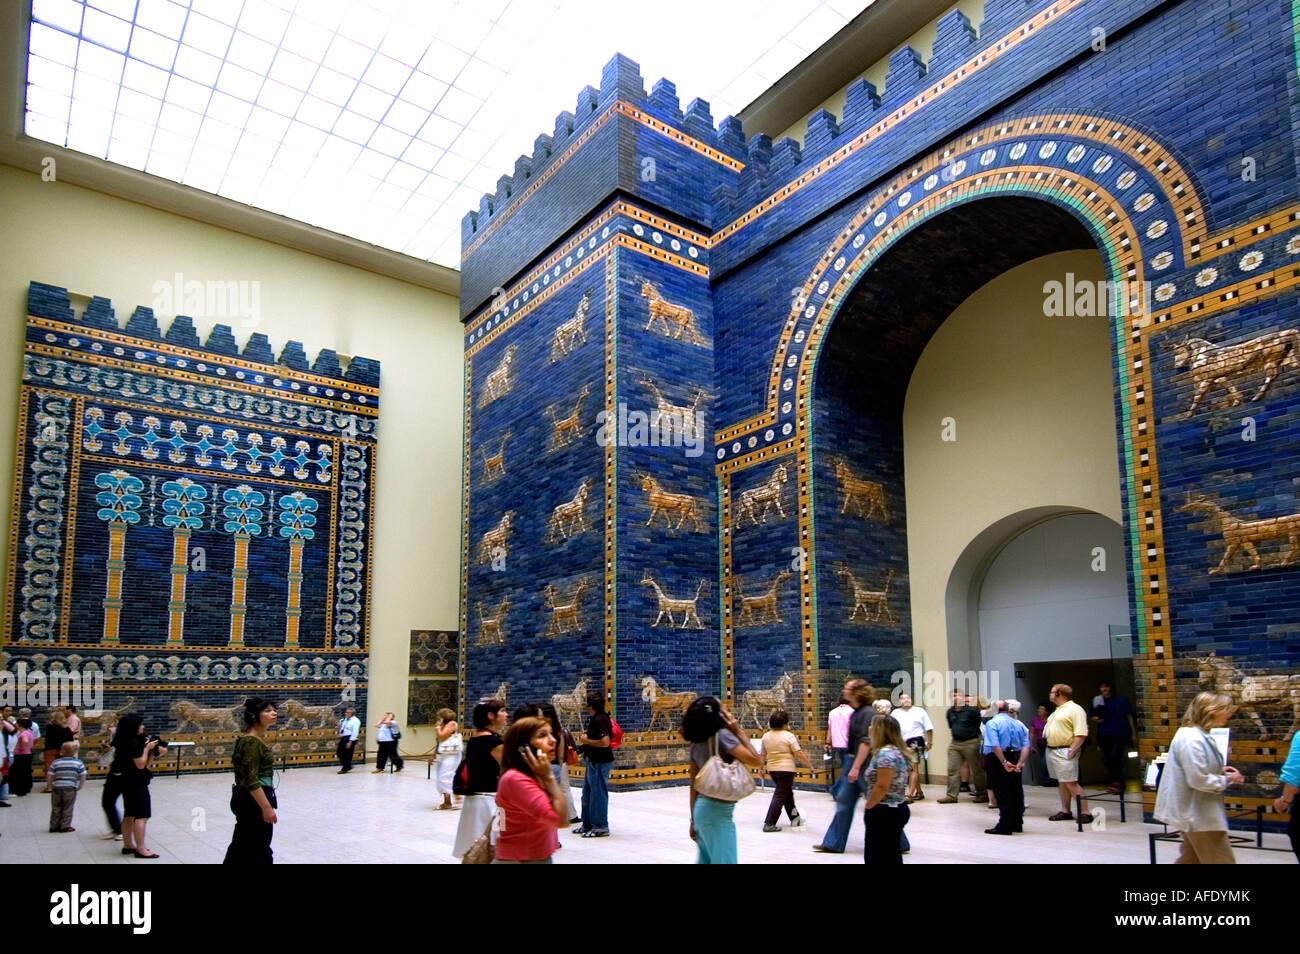 ishtar gate 580 bc neo babylonian empire babylon 6th century b c